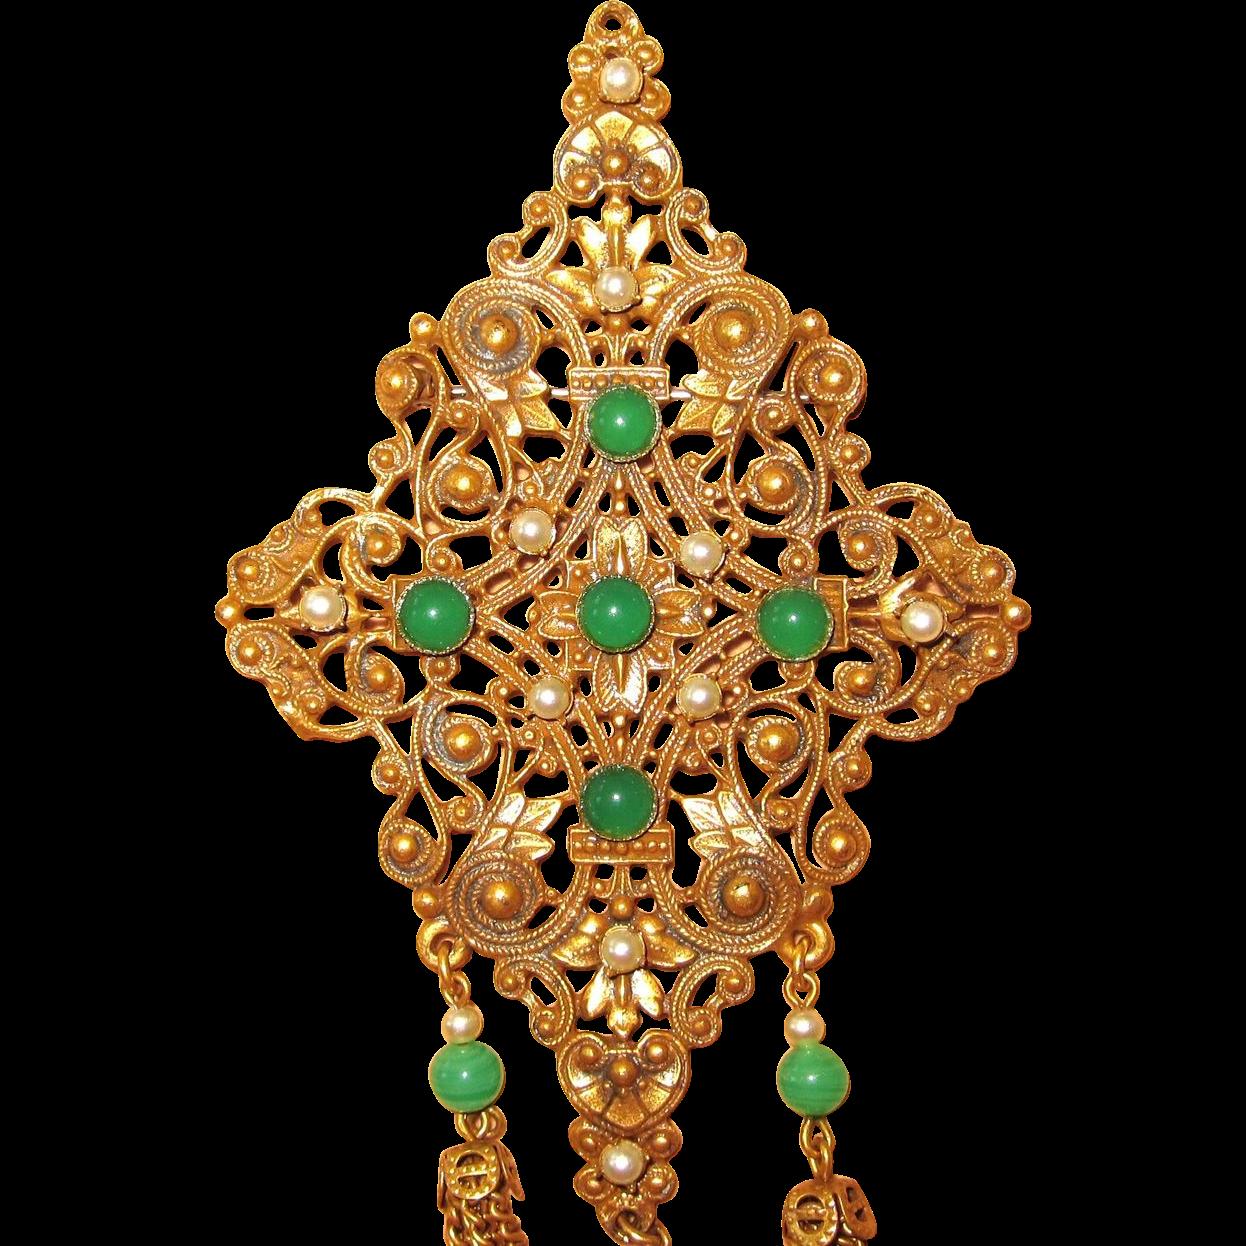 Vintage Large Ornate Brooch And Clip Earrings